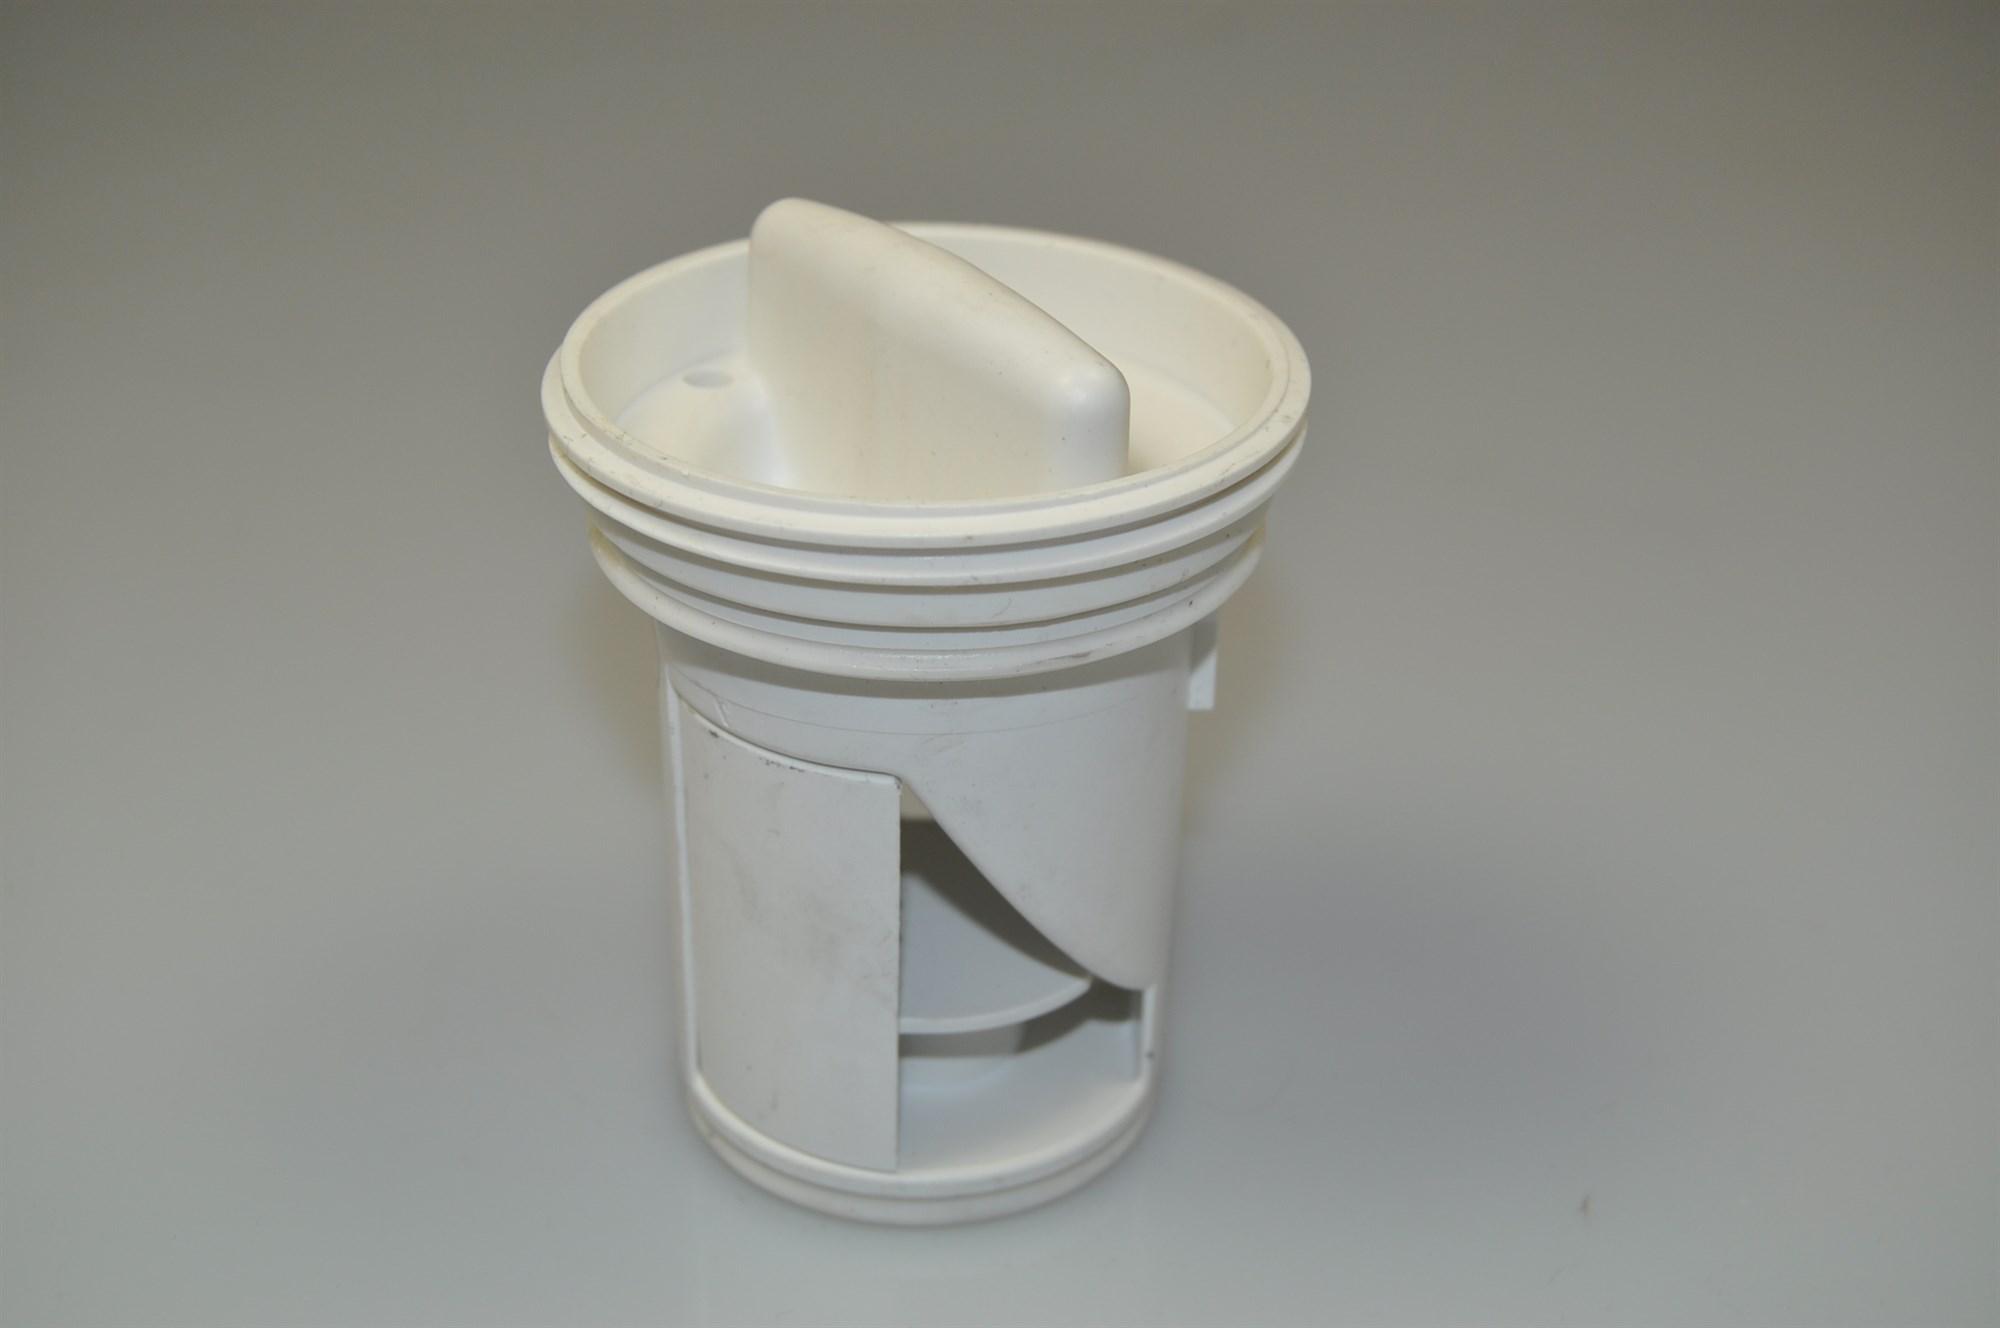 Pump Filter Maytag Washing Machine